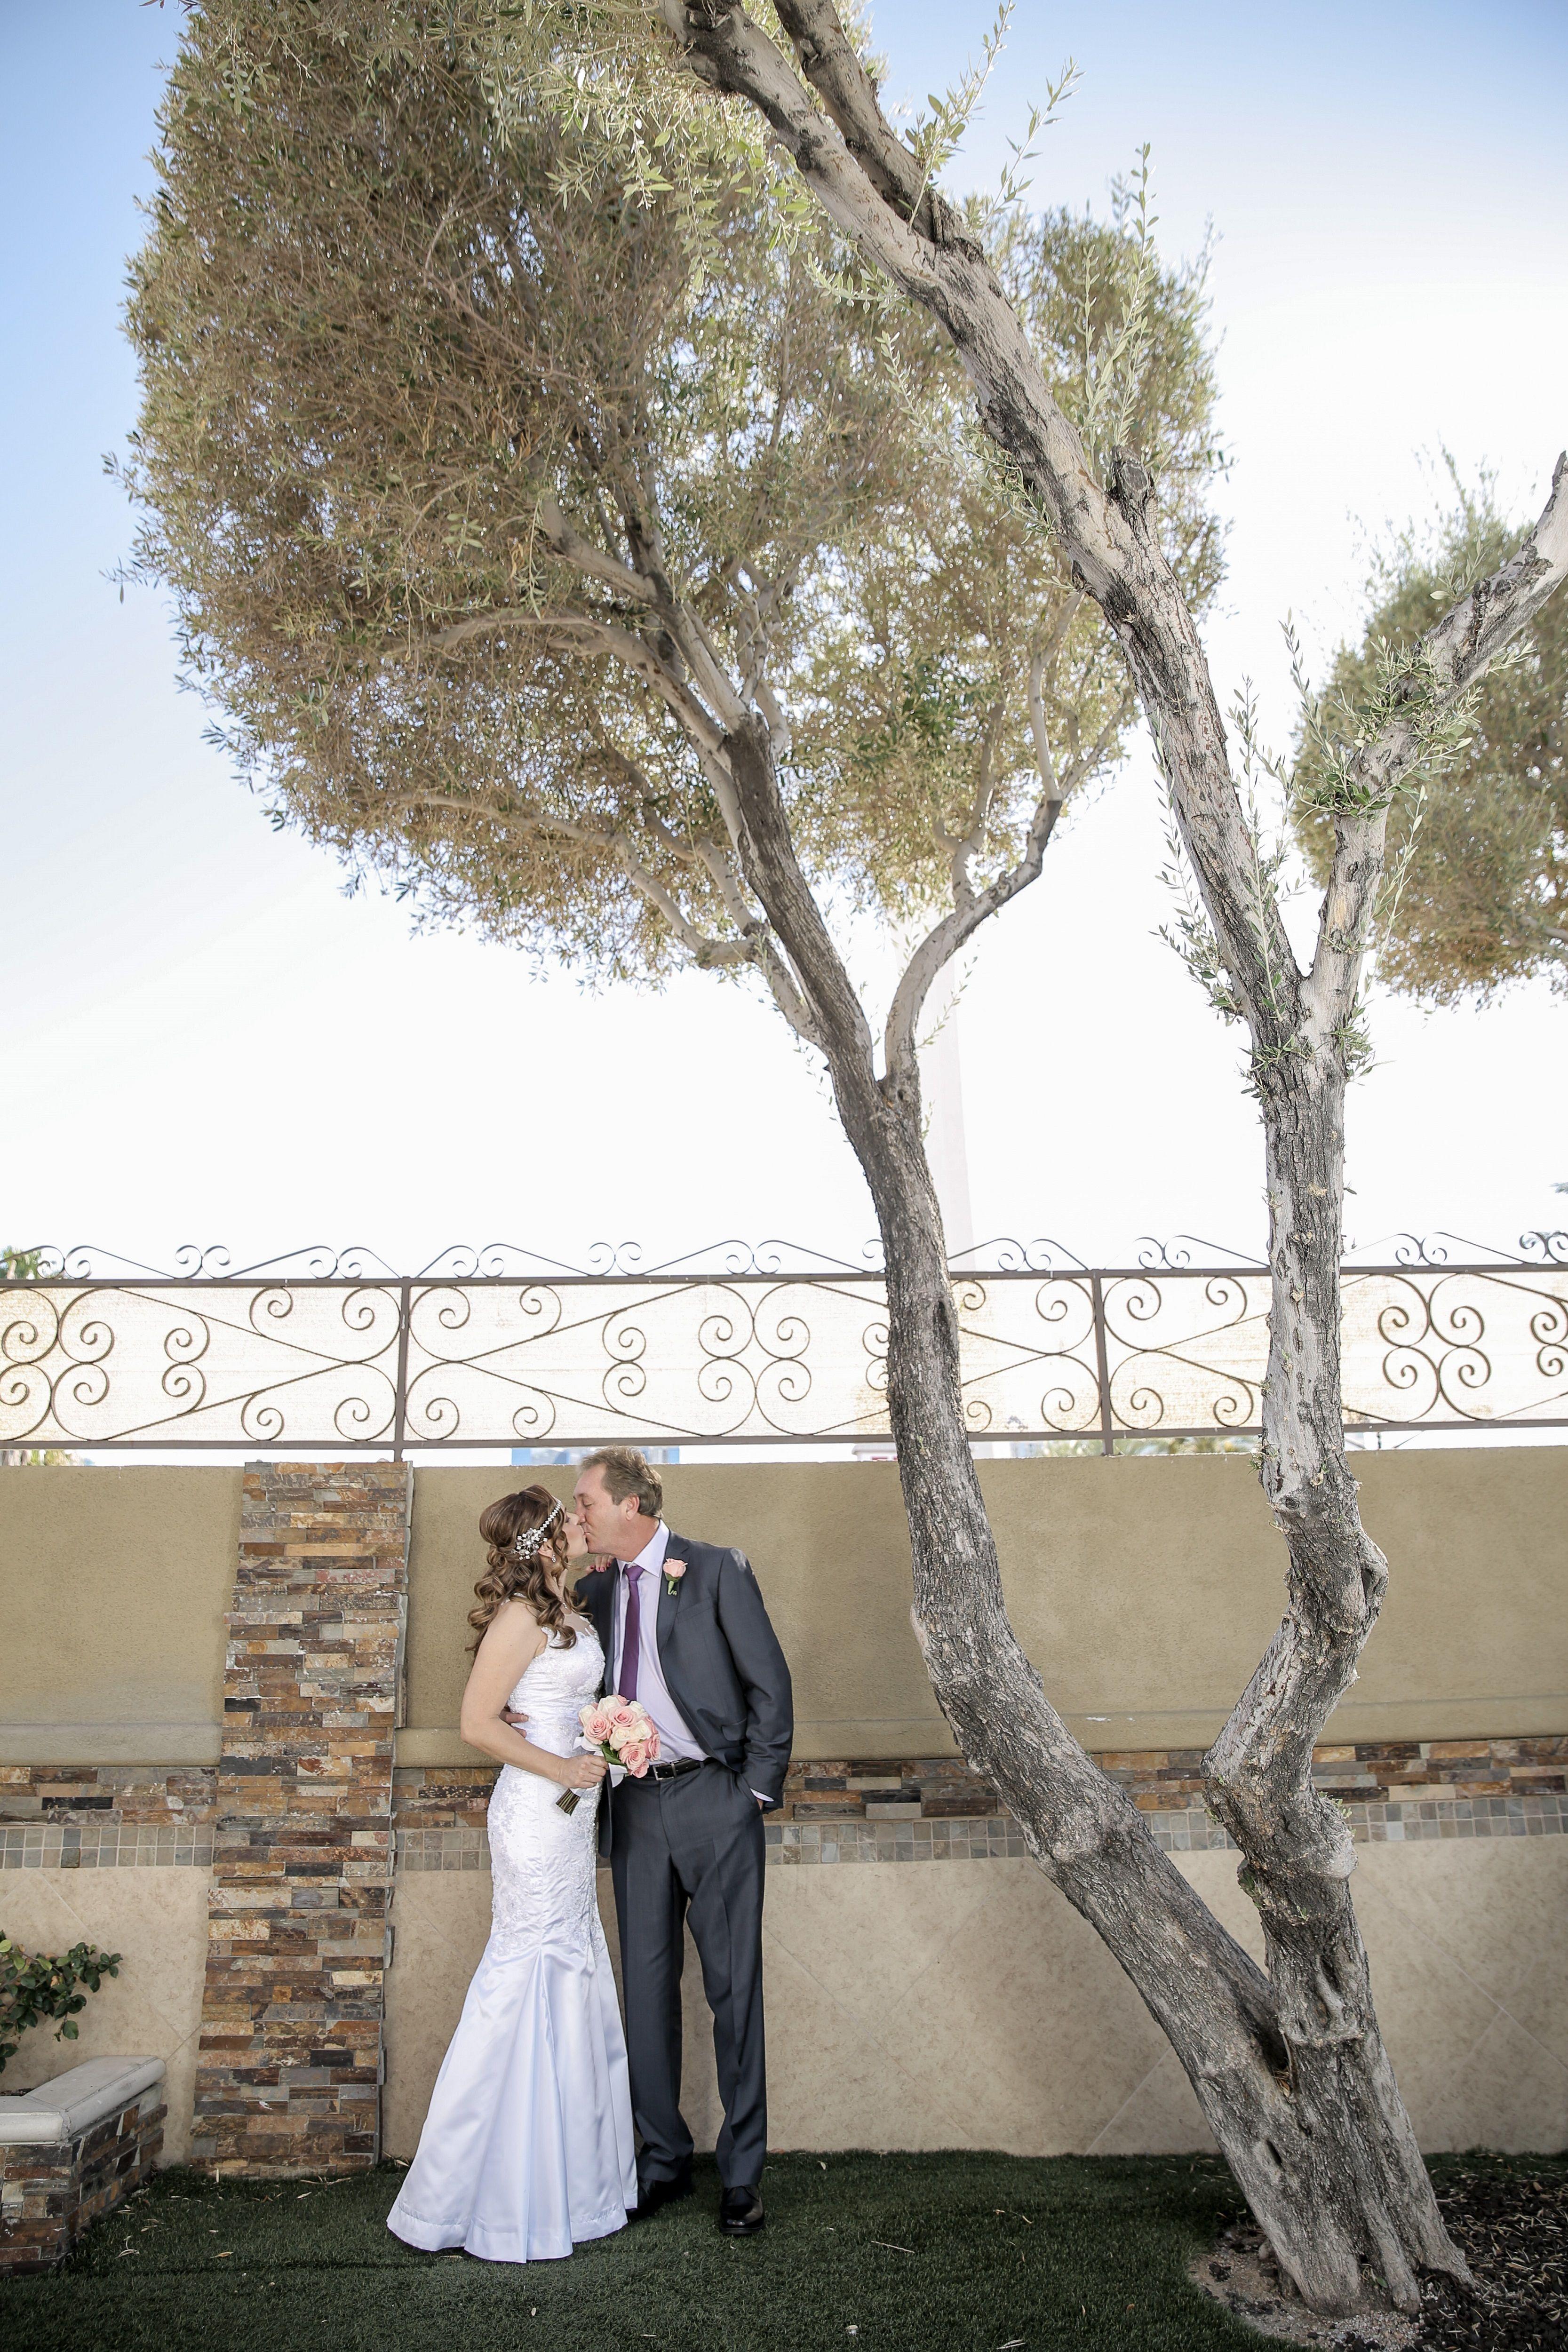 Whimsical Garden Weddings In Las Vegas Outdoor Wedding Venue With